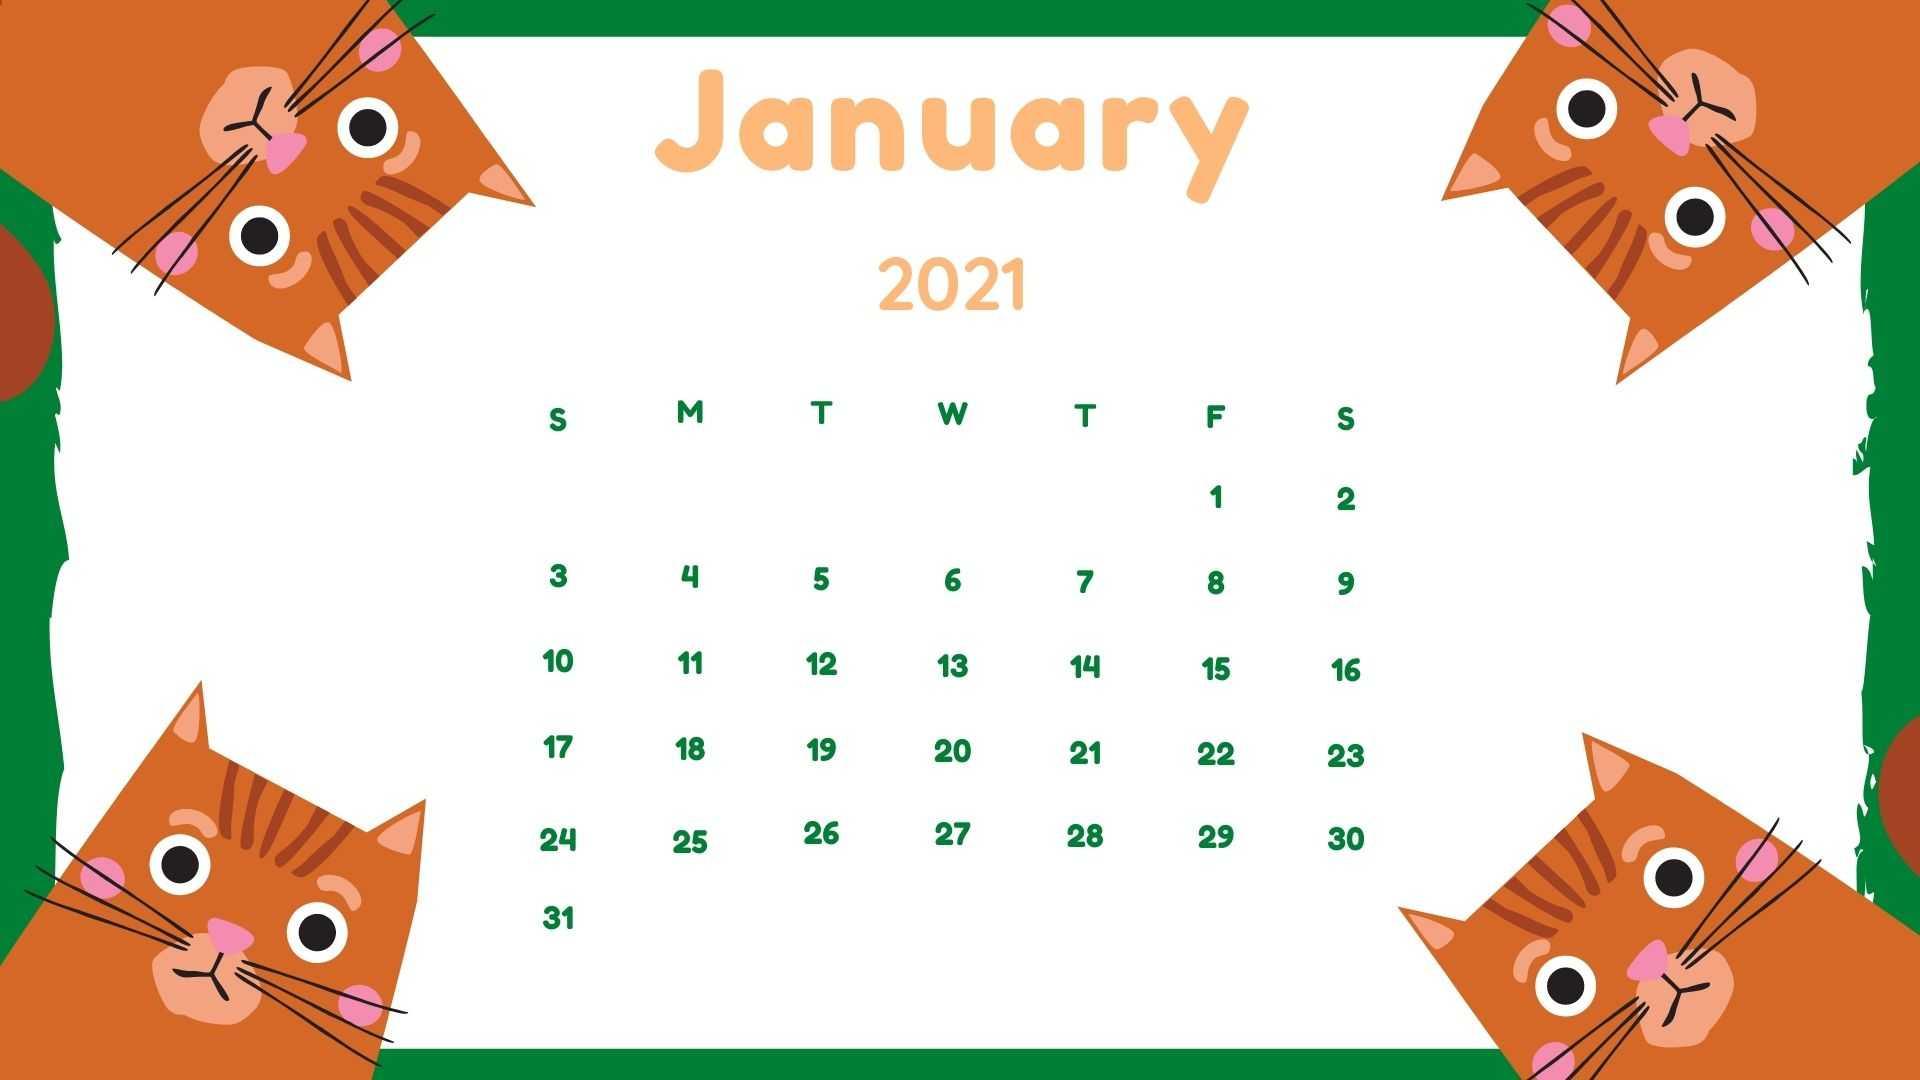 January Calendar 2021 Wallpaper   KoLPaPer   Awesome HD 1920x1080